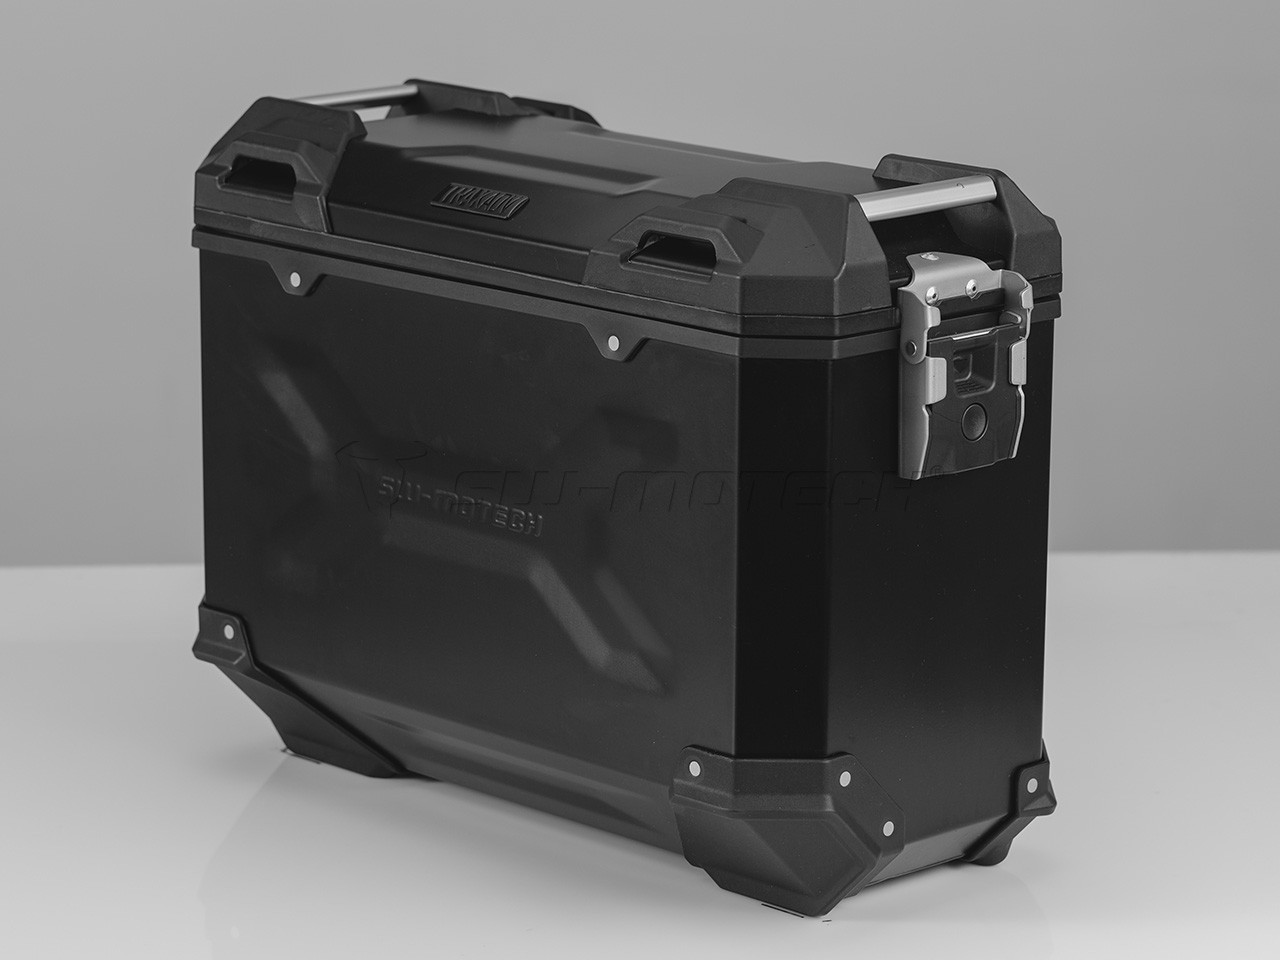 BMW S 1000 XR (15-) - sada bočních kufrů TRAX Adventure 37 l s n